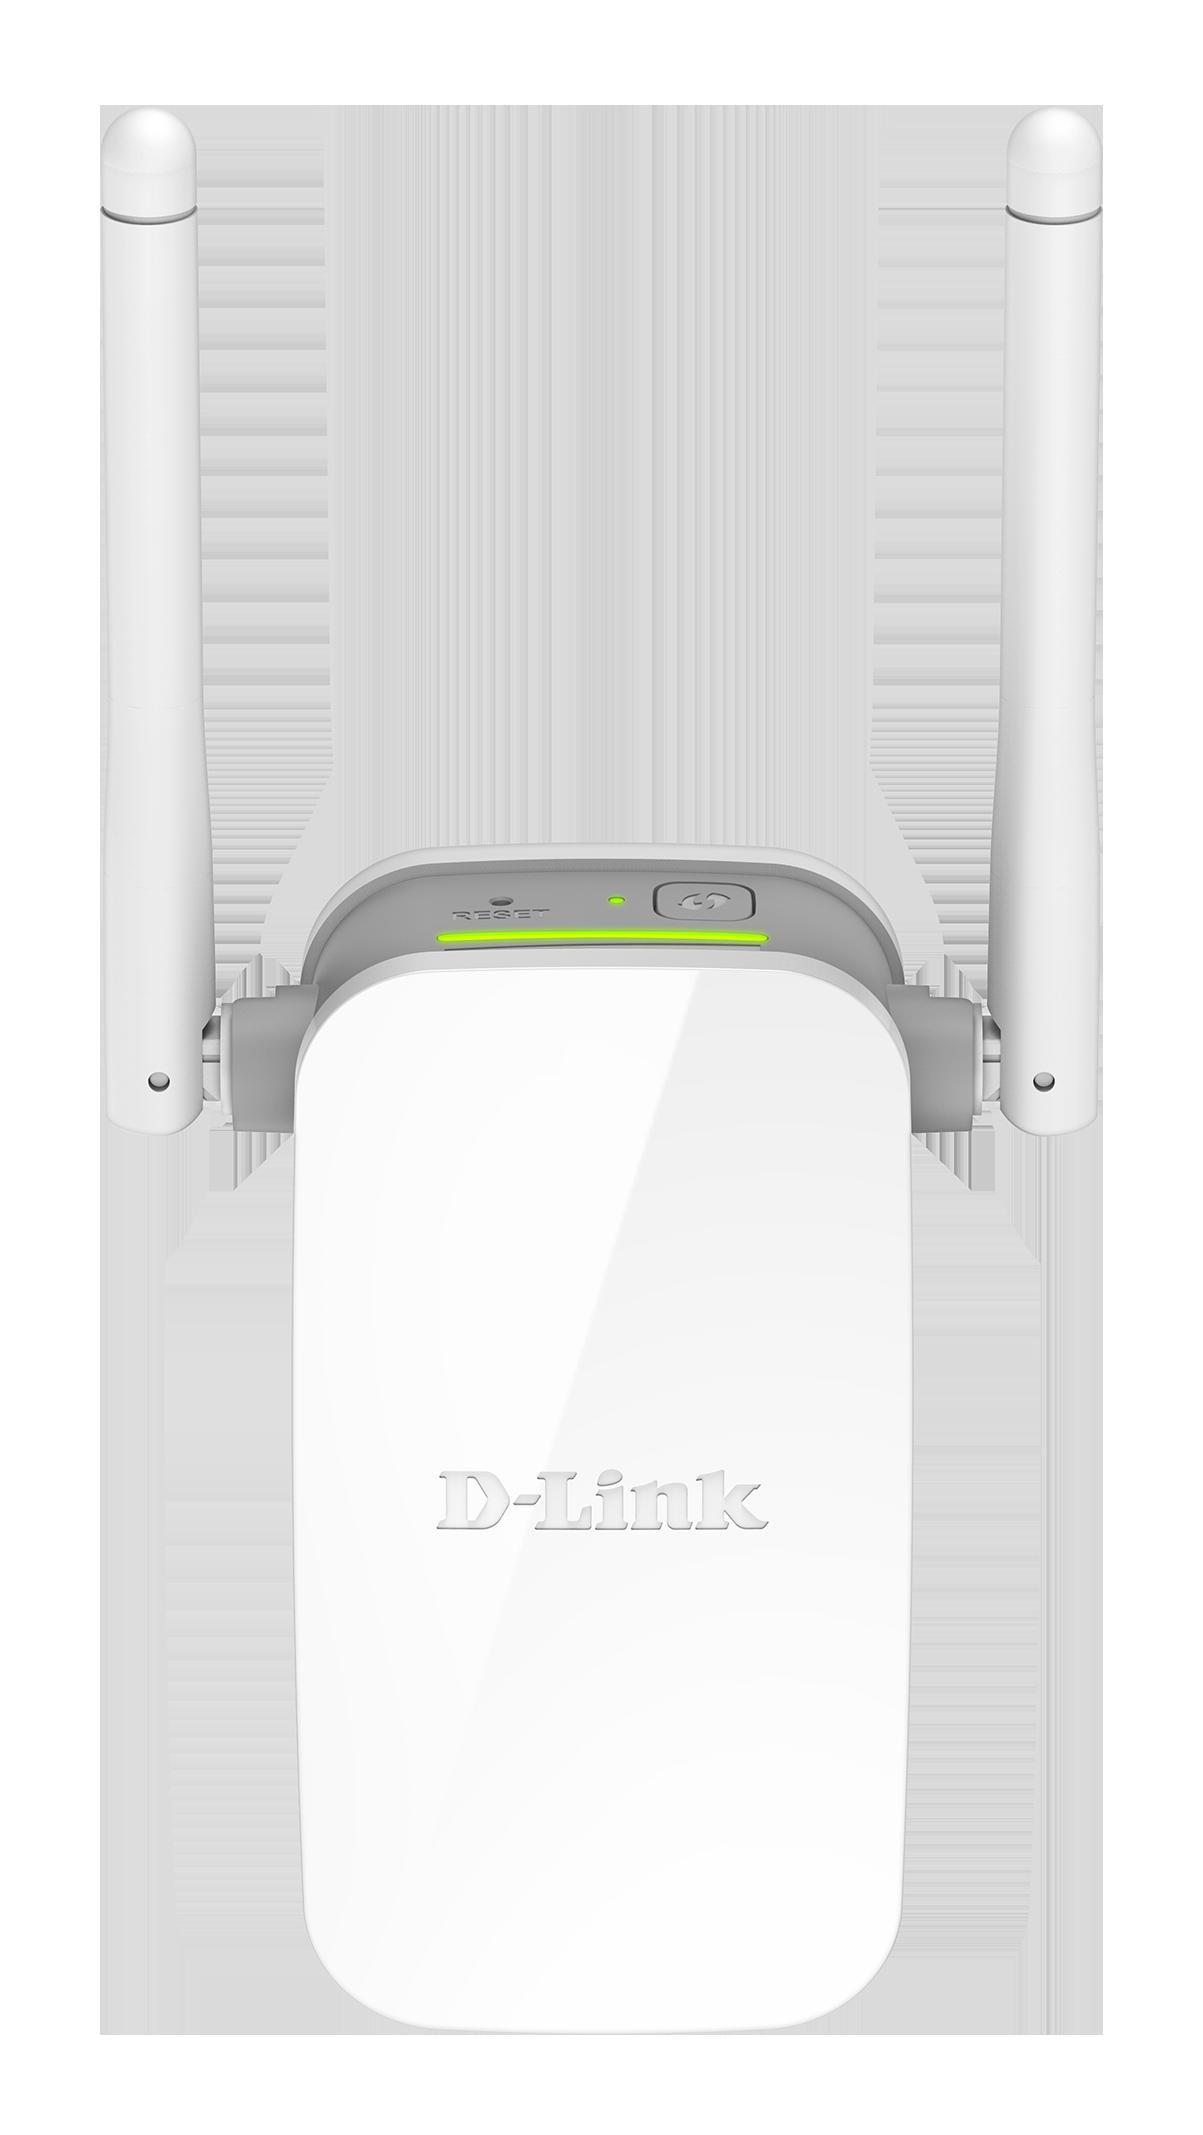 Dlink repeater setup